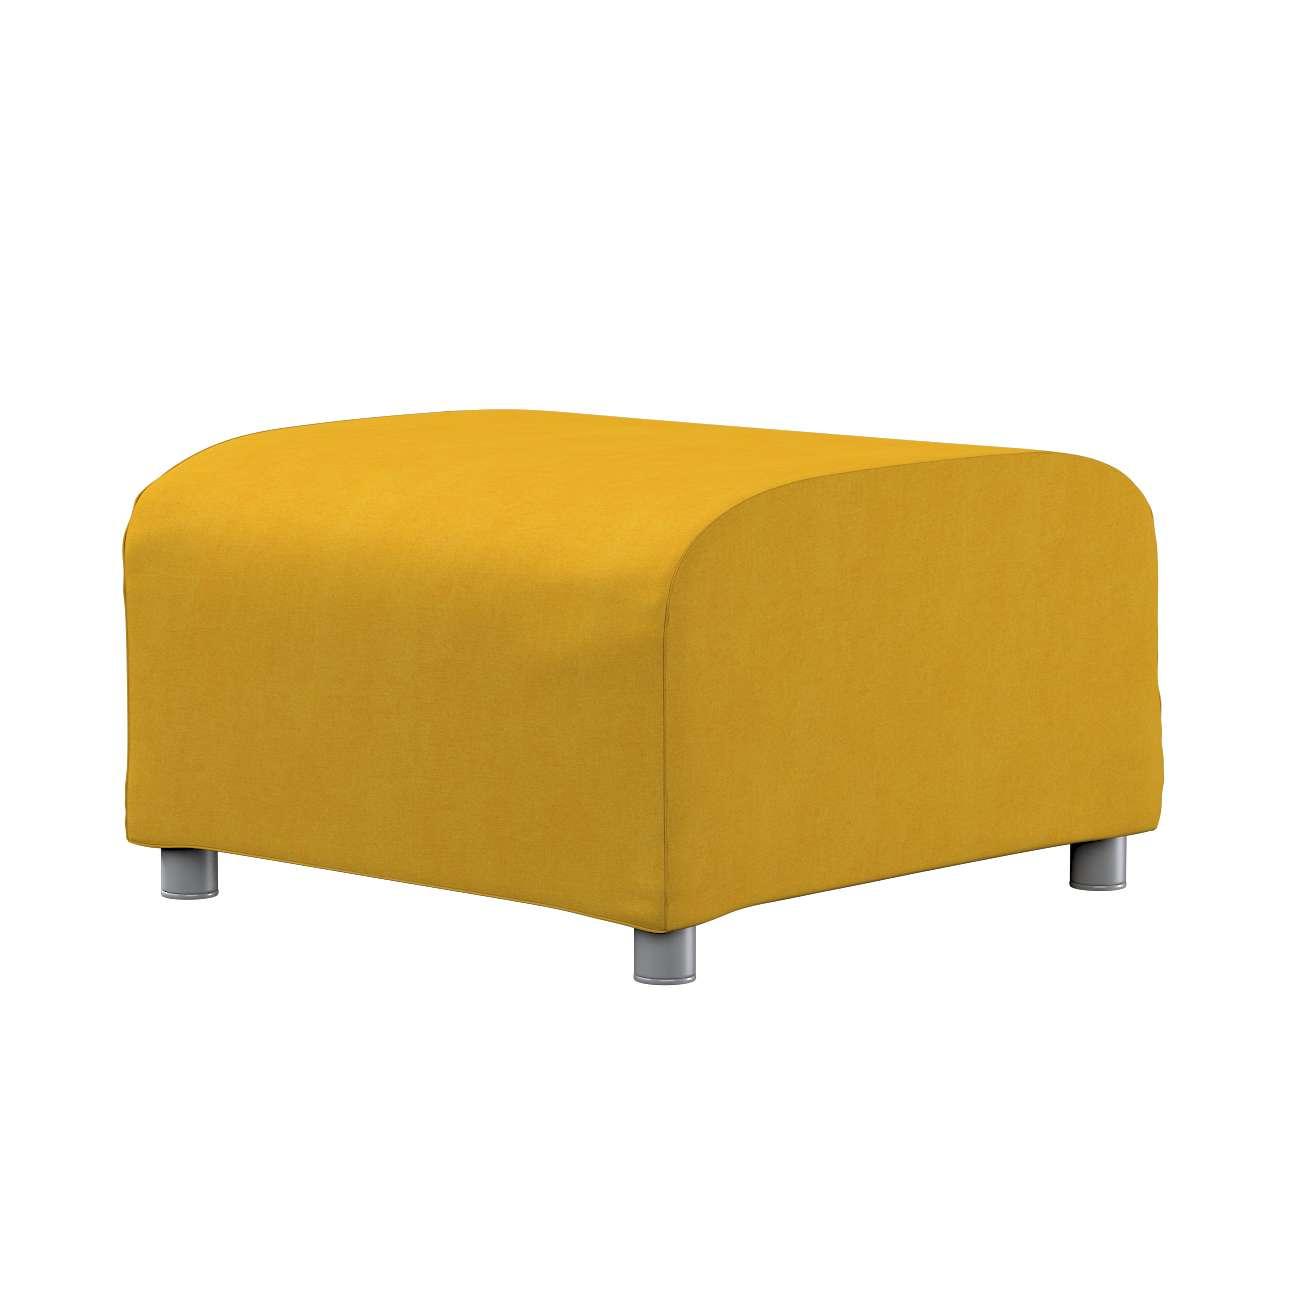 KLIPPAN pufo užvalkalas Klippan footstool cover kolekcijoje Etna , audinys: 705-04